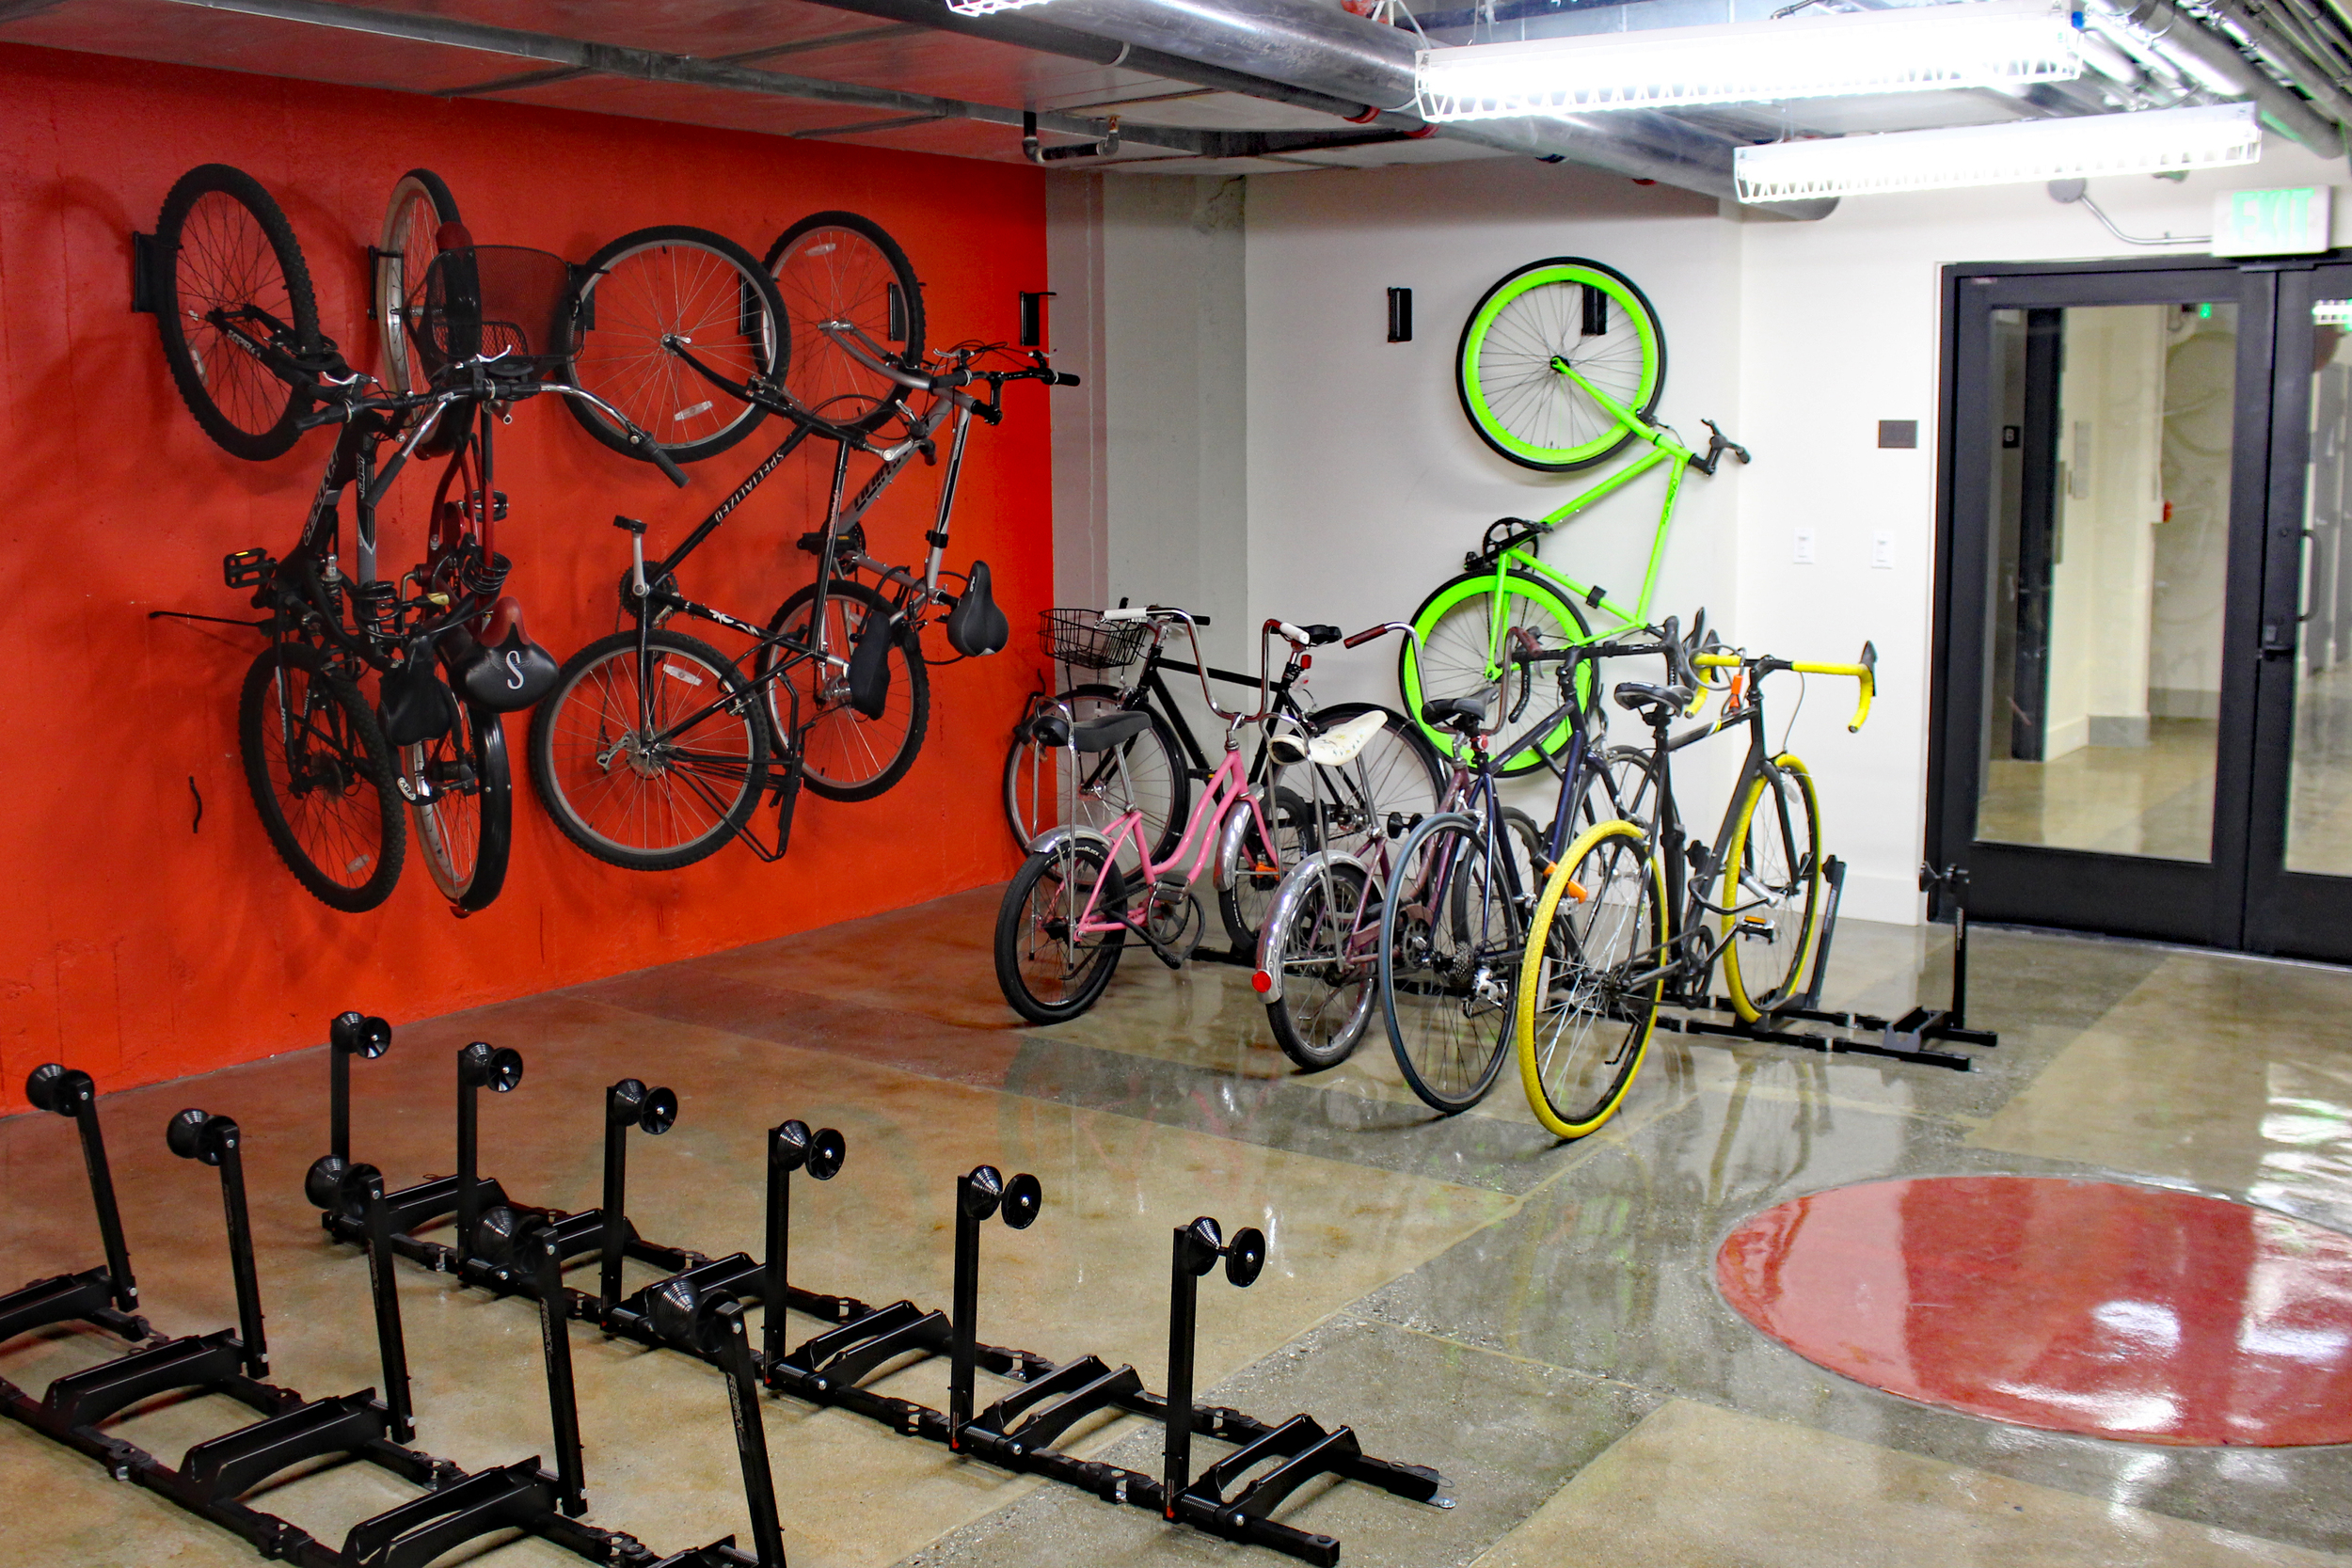 Bicycle Storage at Garment Lofts